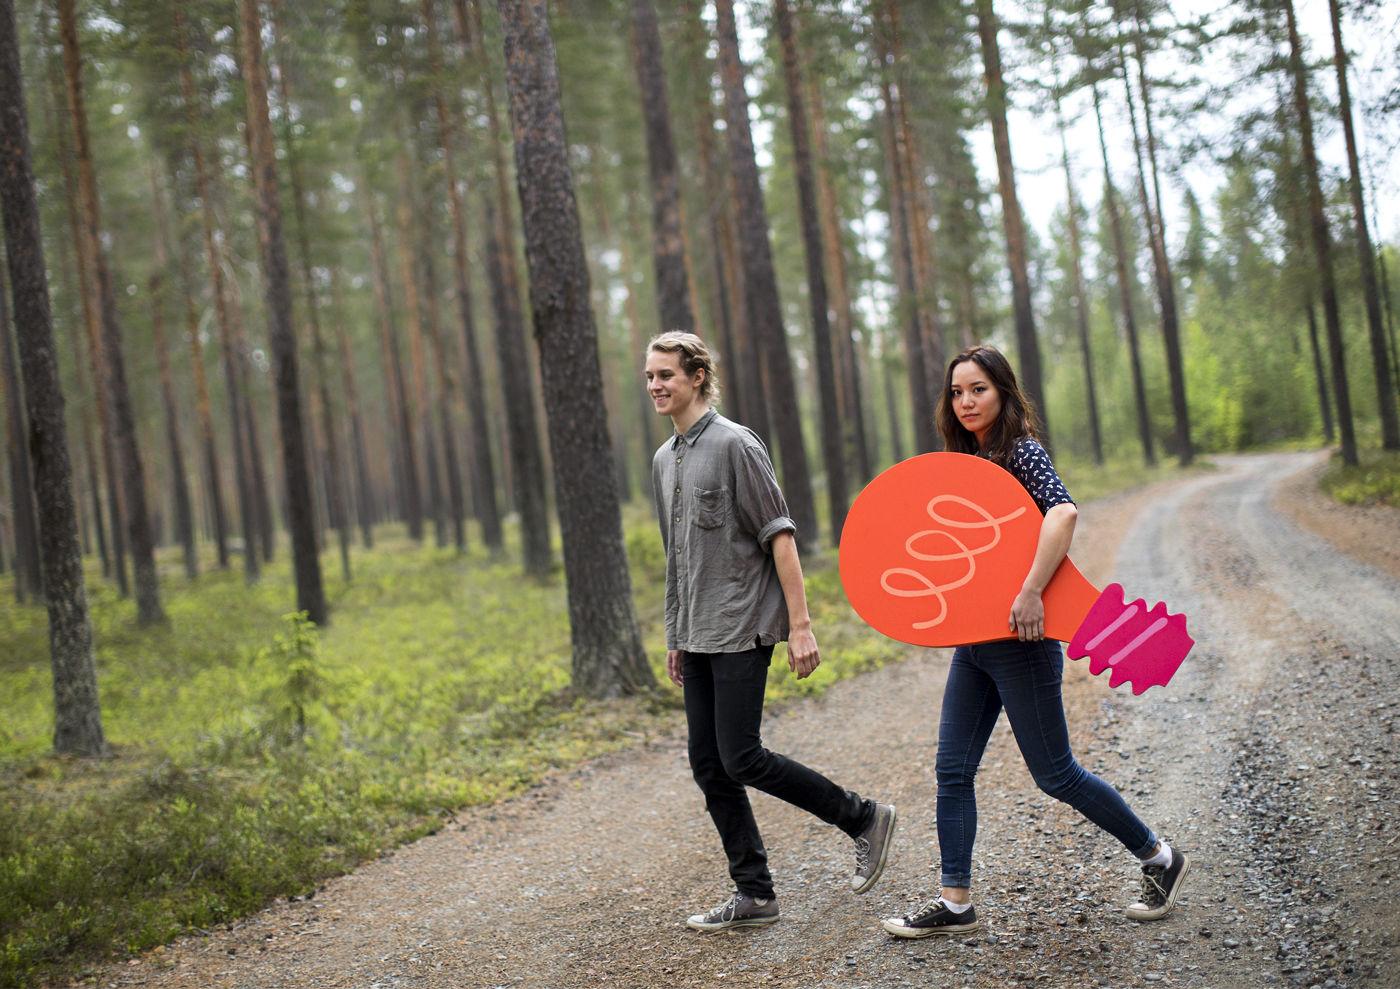 AGENT MOLLY & CO: Andreas Samuelsson for Skellefteå Kraft